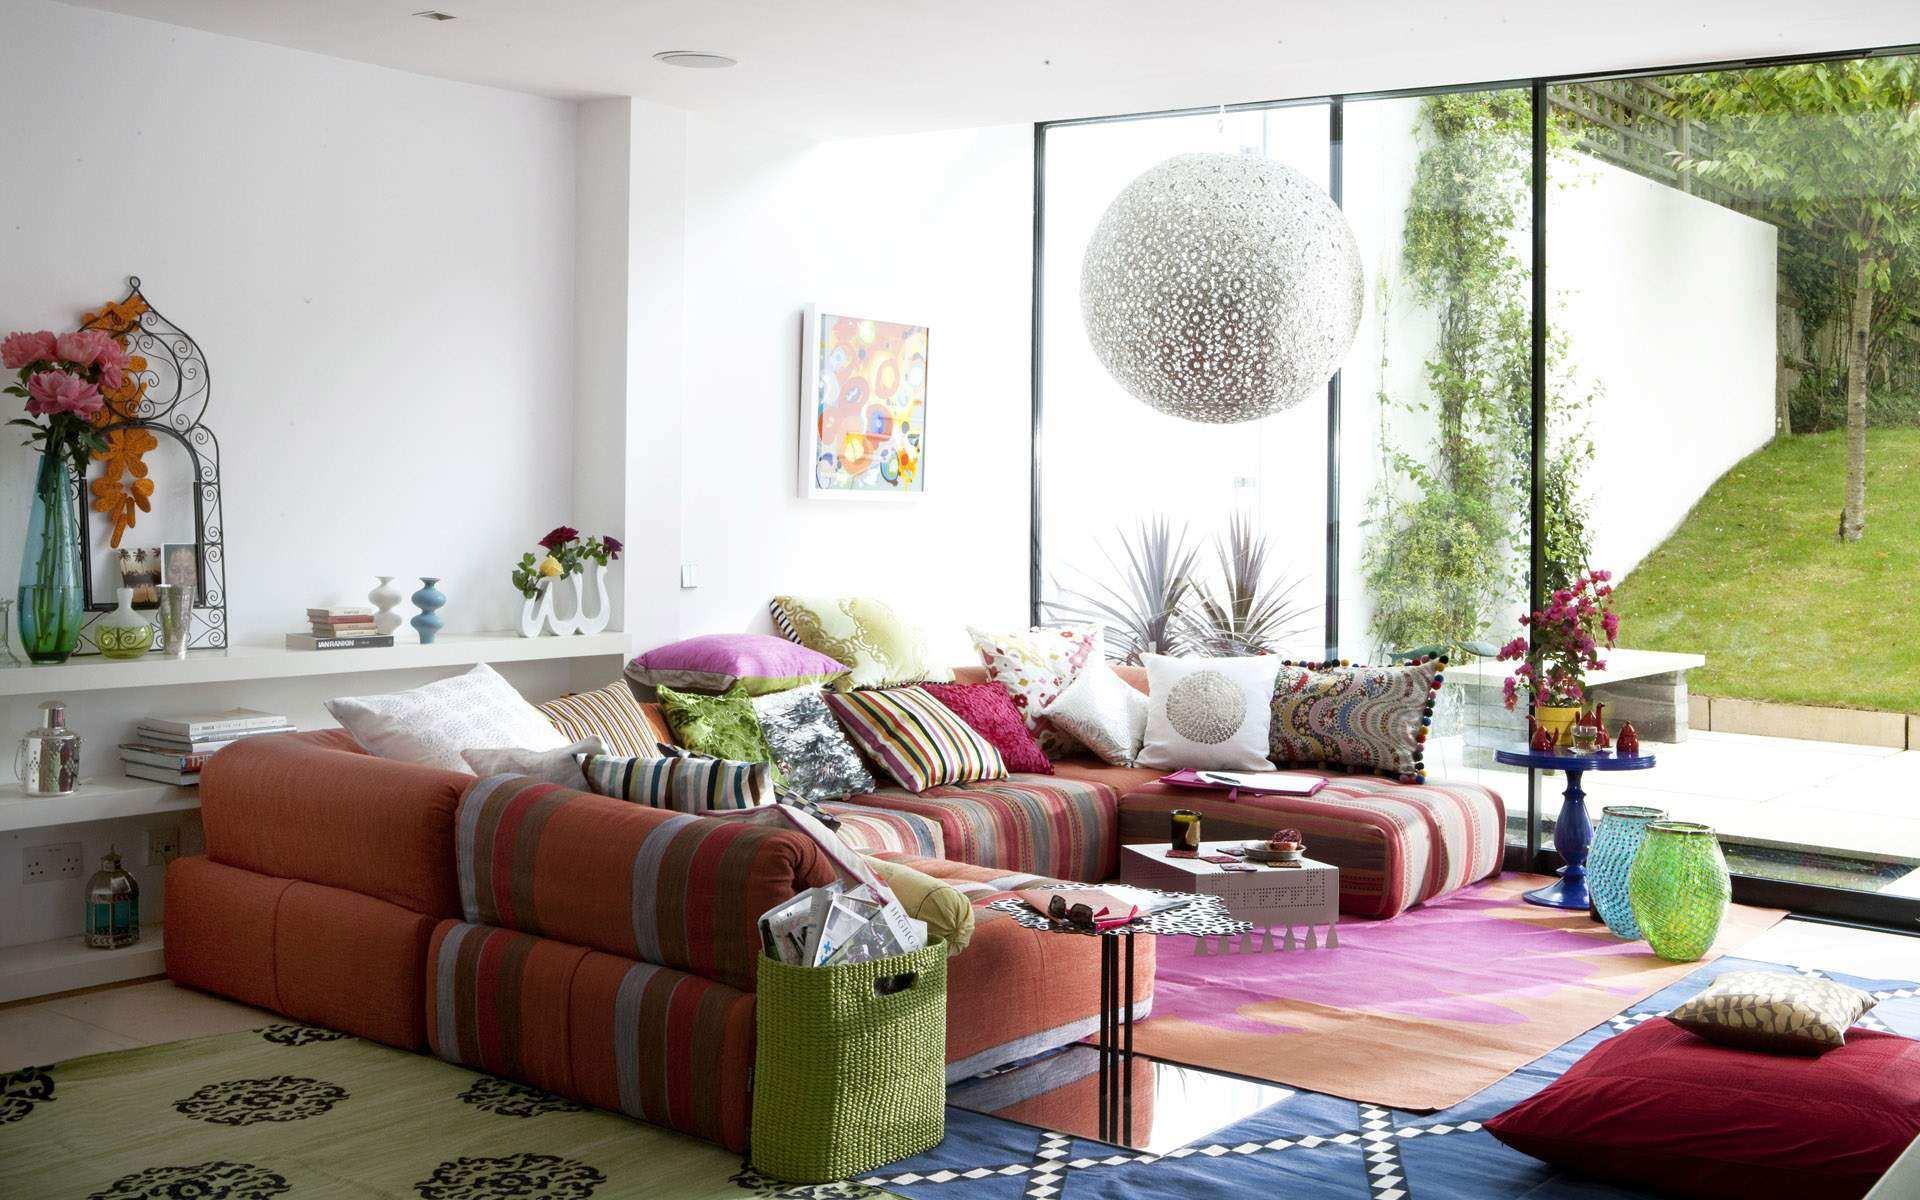 Family Room Ideas – Make Your House Feel Like Home | Her Beauty